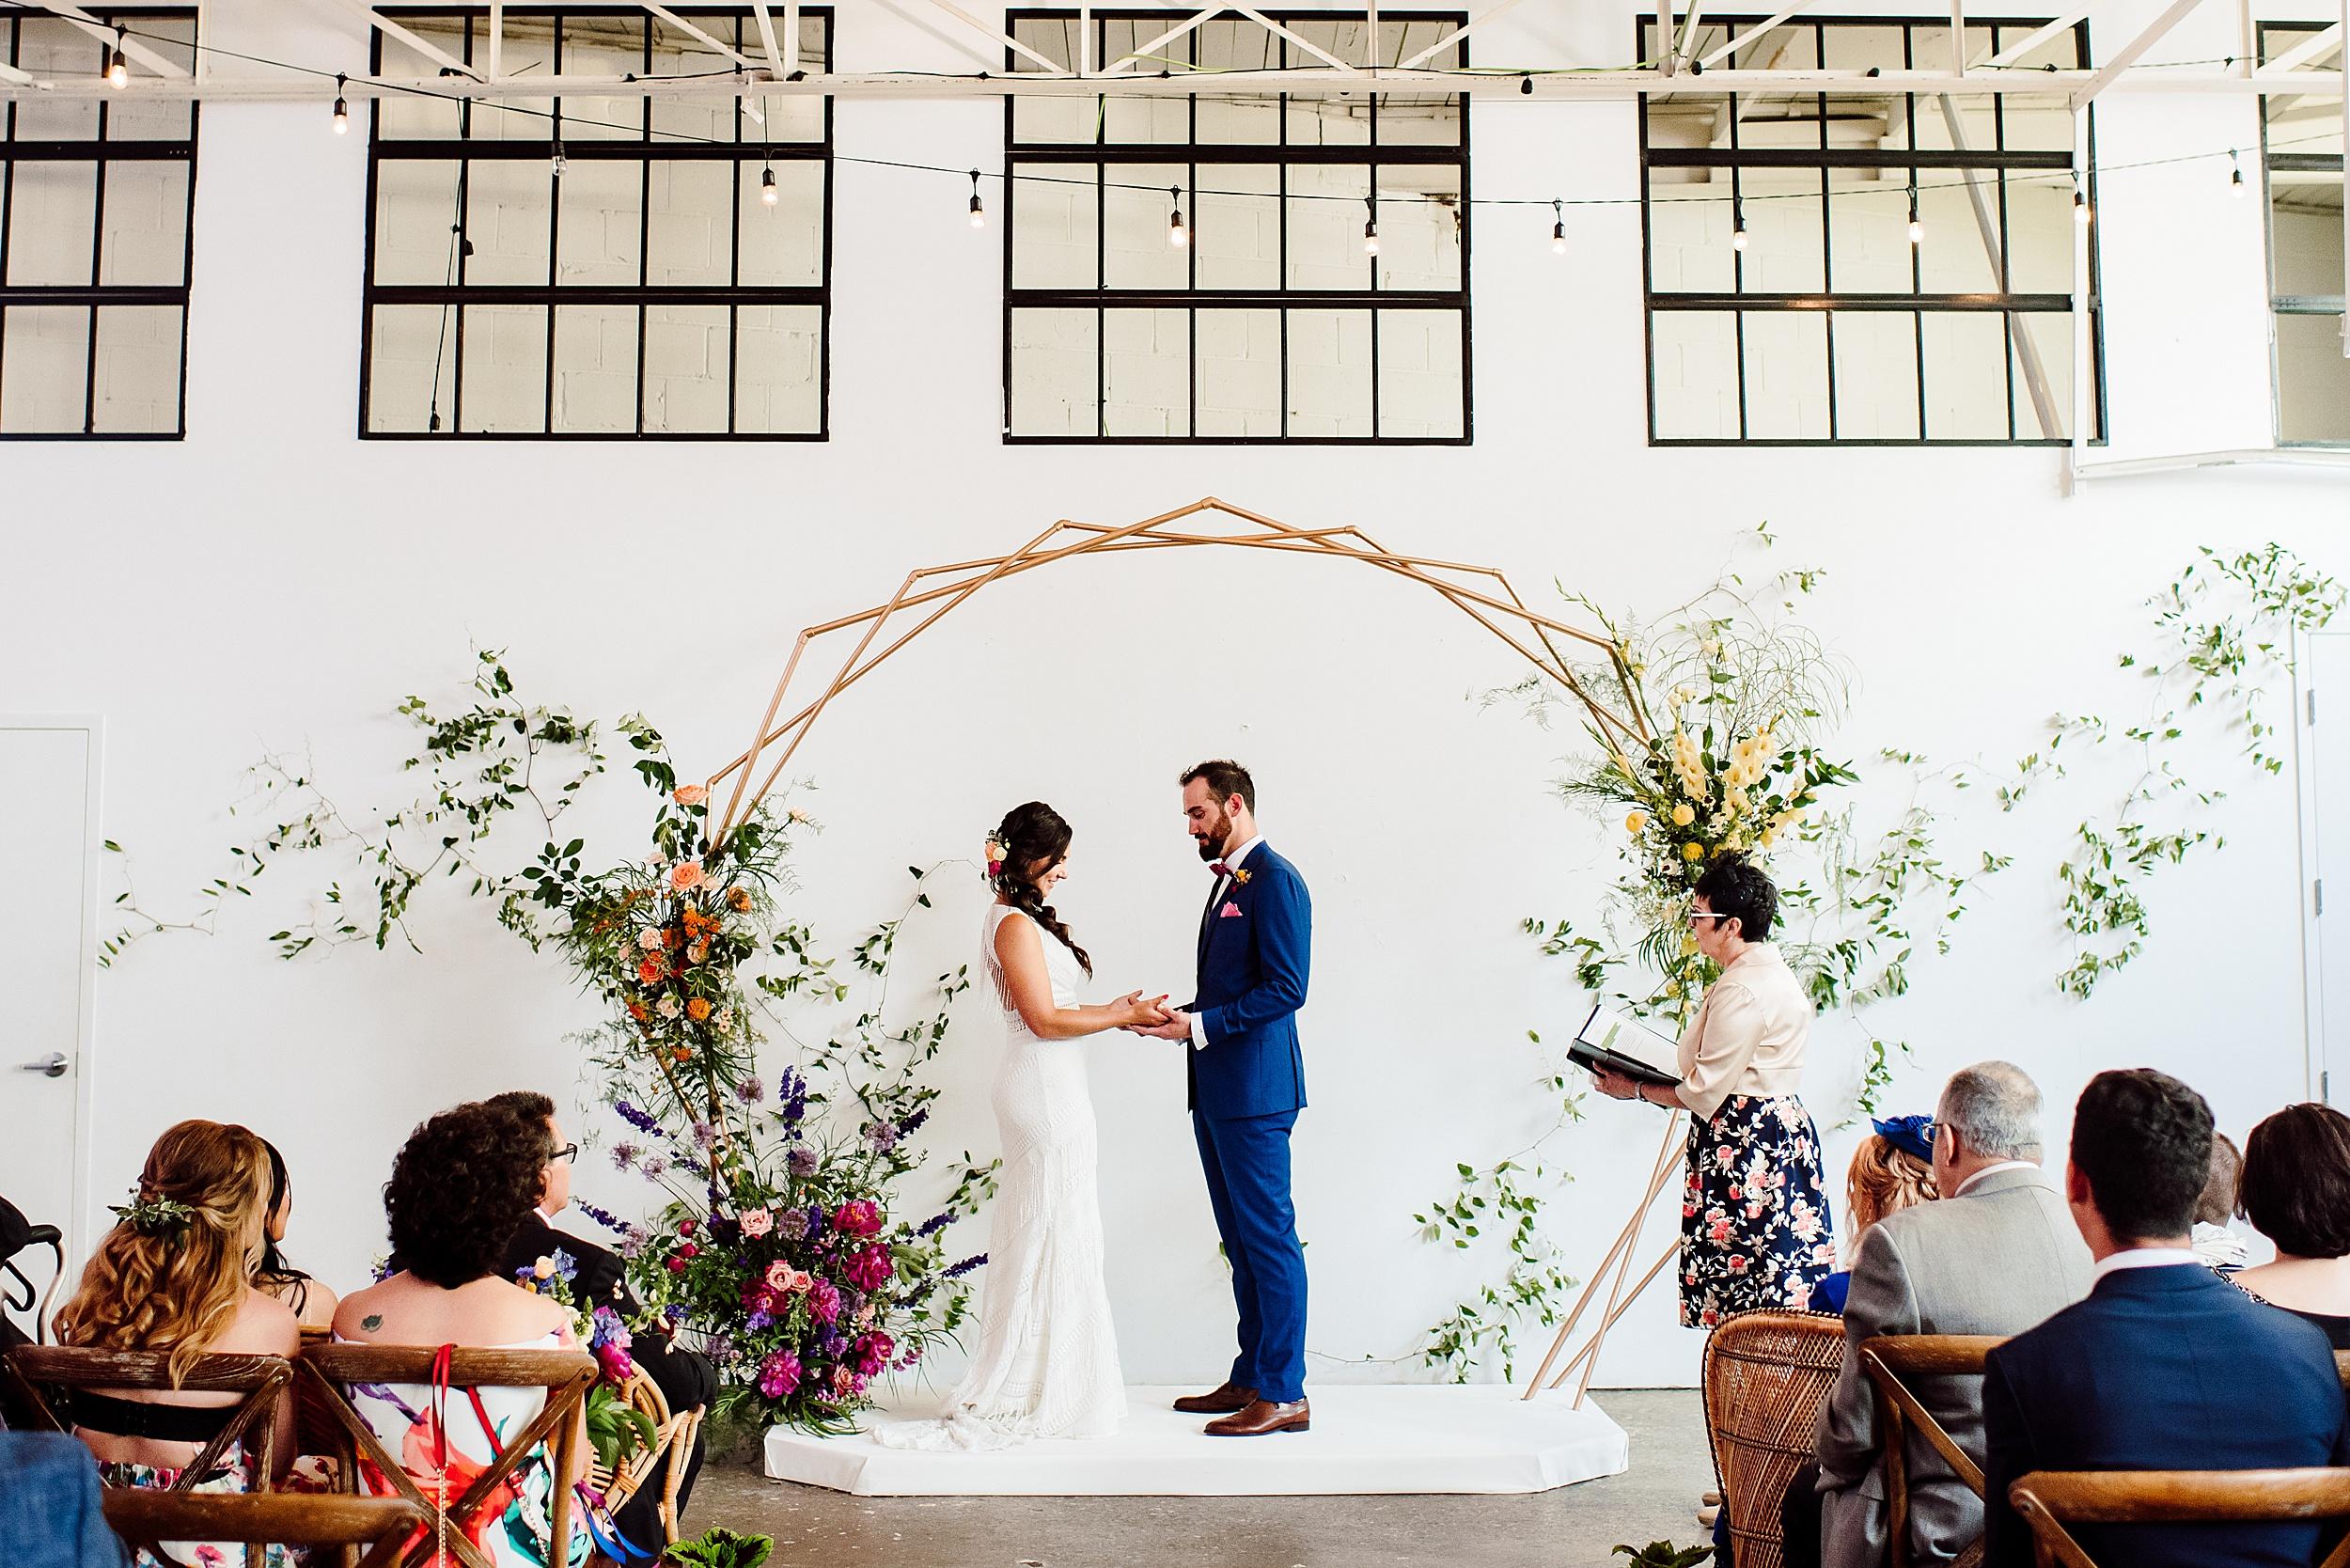 Airship-37-Berkeley-Events-Distillery-District-Wedding-Toronto-Wedding-Photographers_0067.jpg